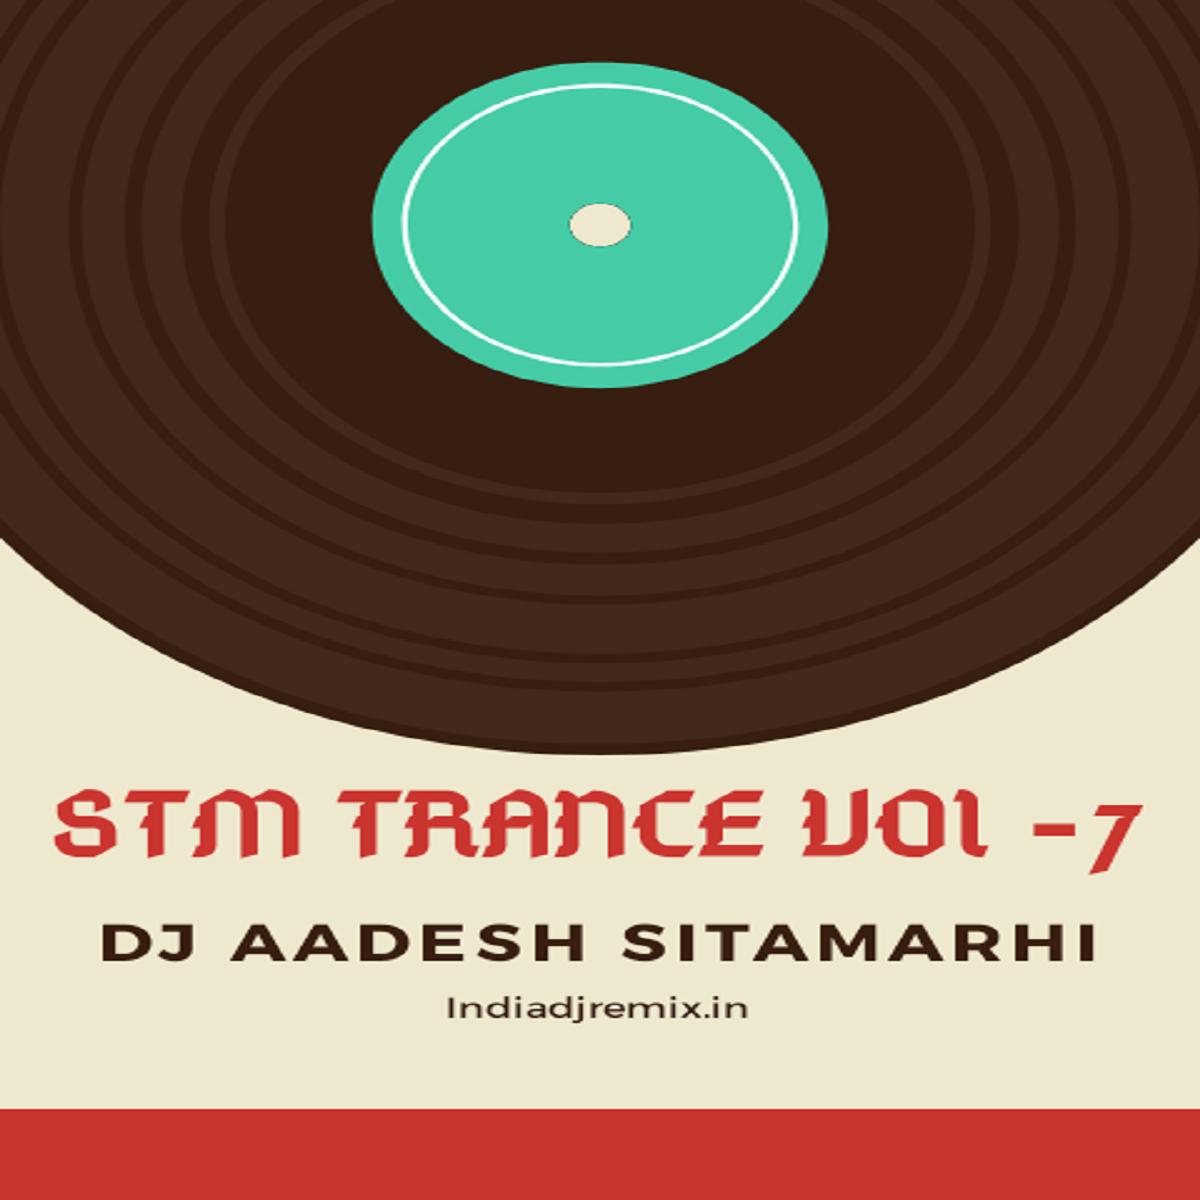 STM TRANCE VOL.07 - DJ AADESH SITAMARHI